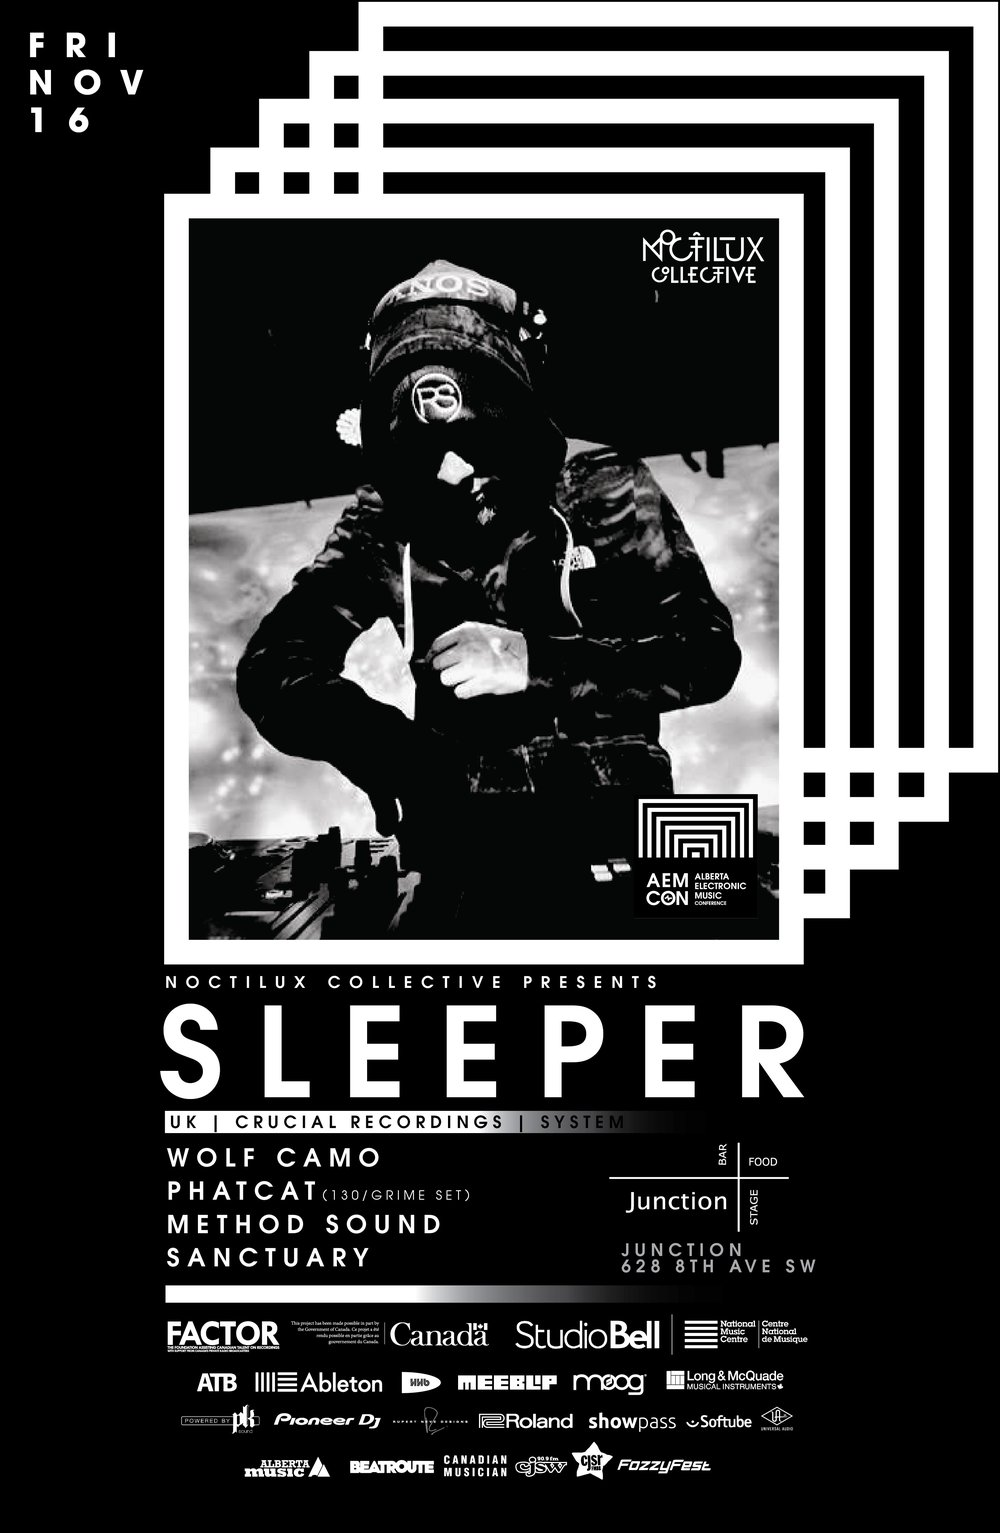 SLEEPER-01.jpg